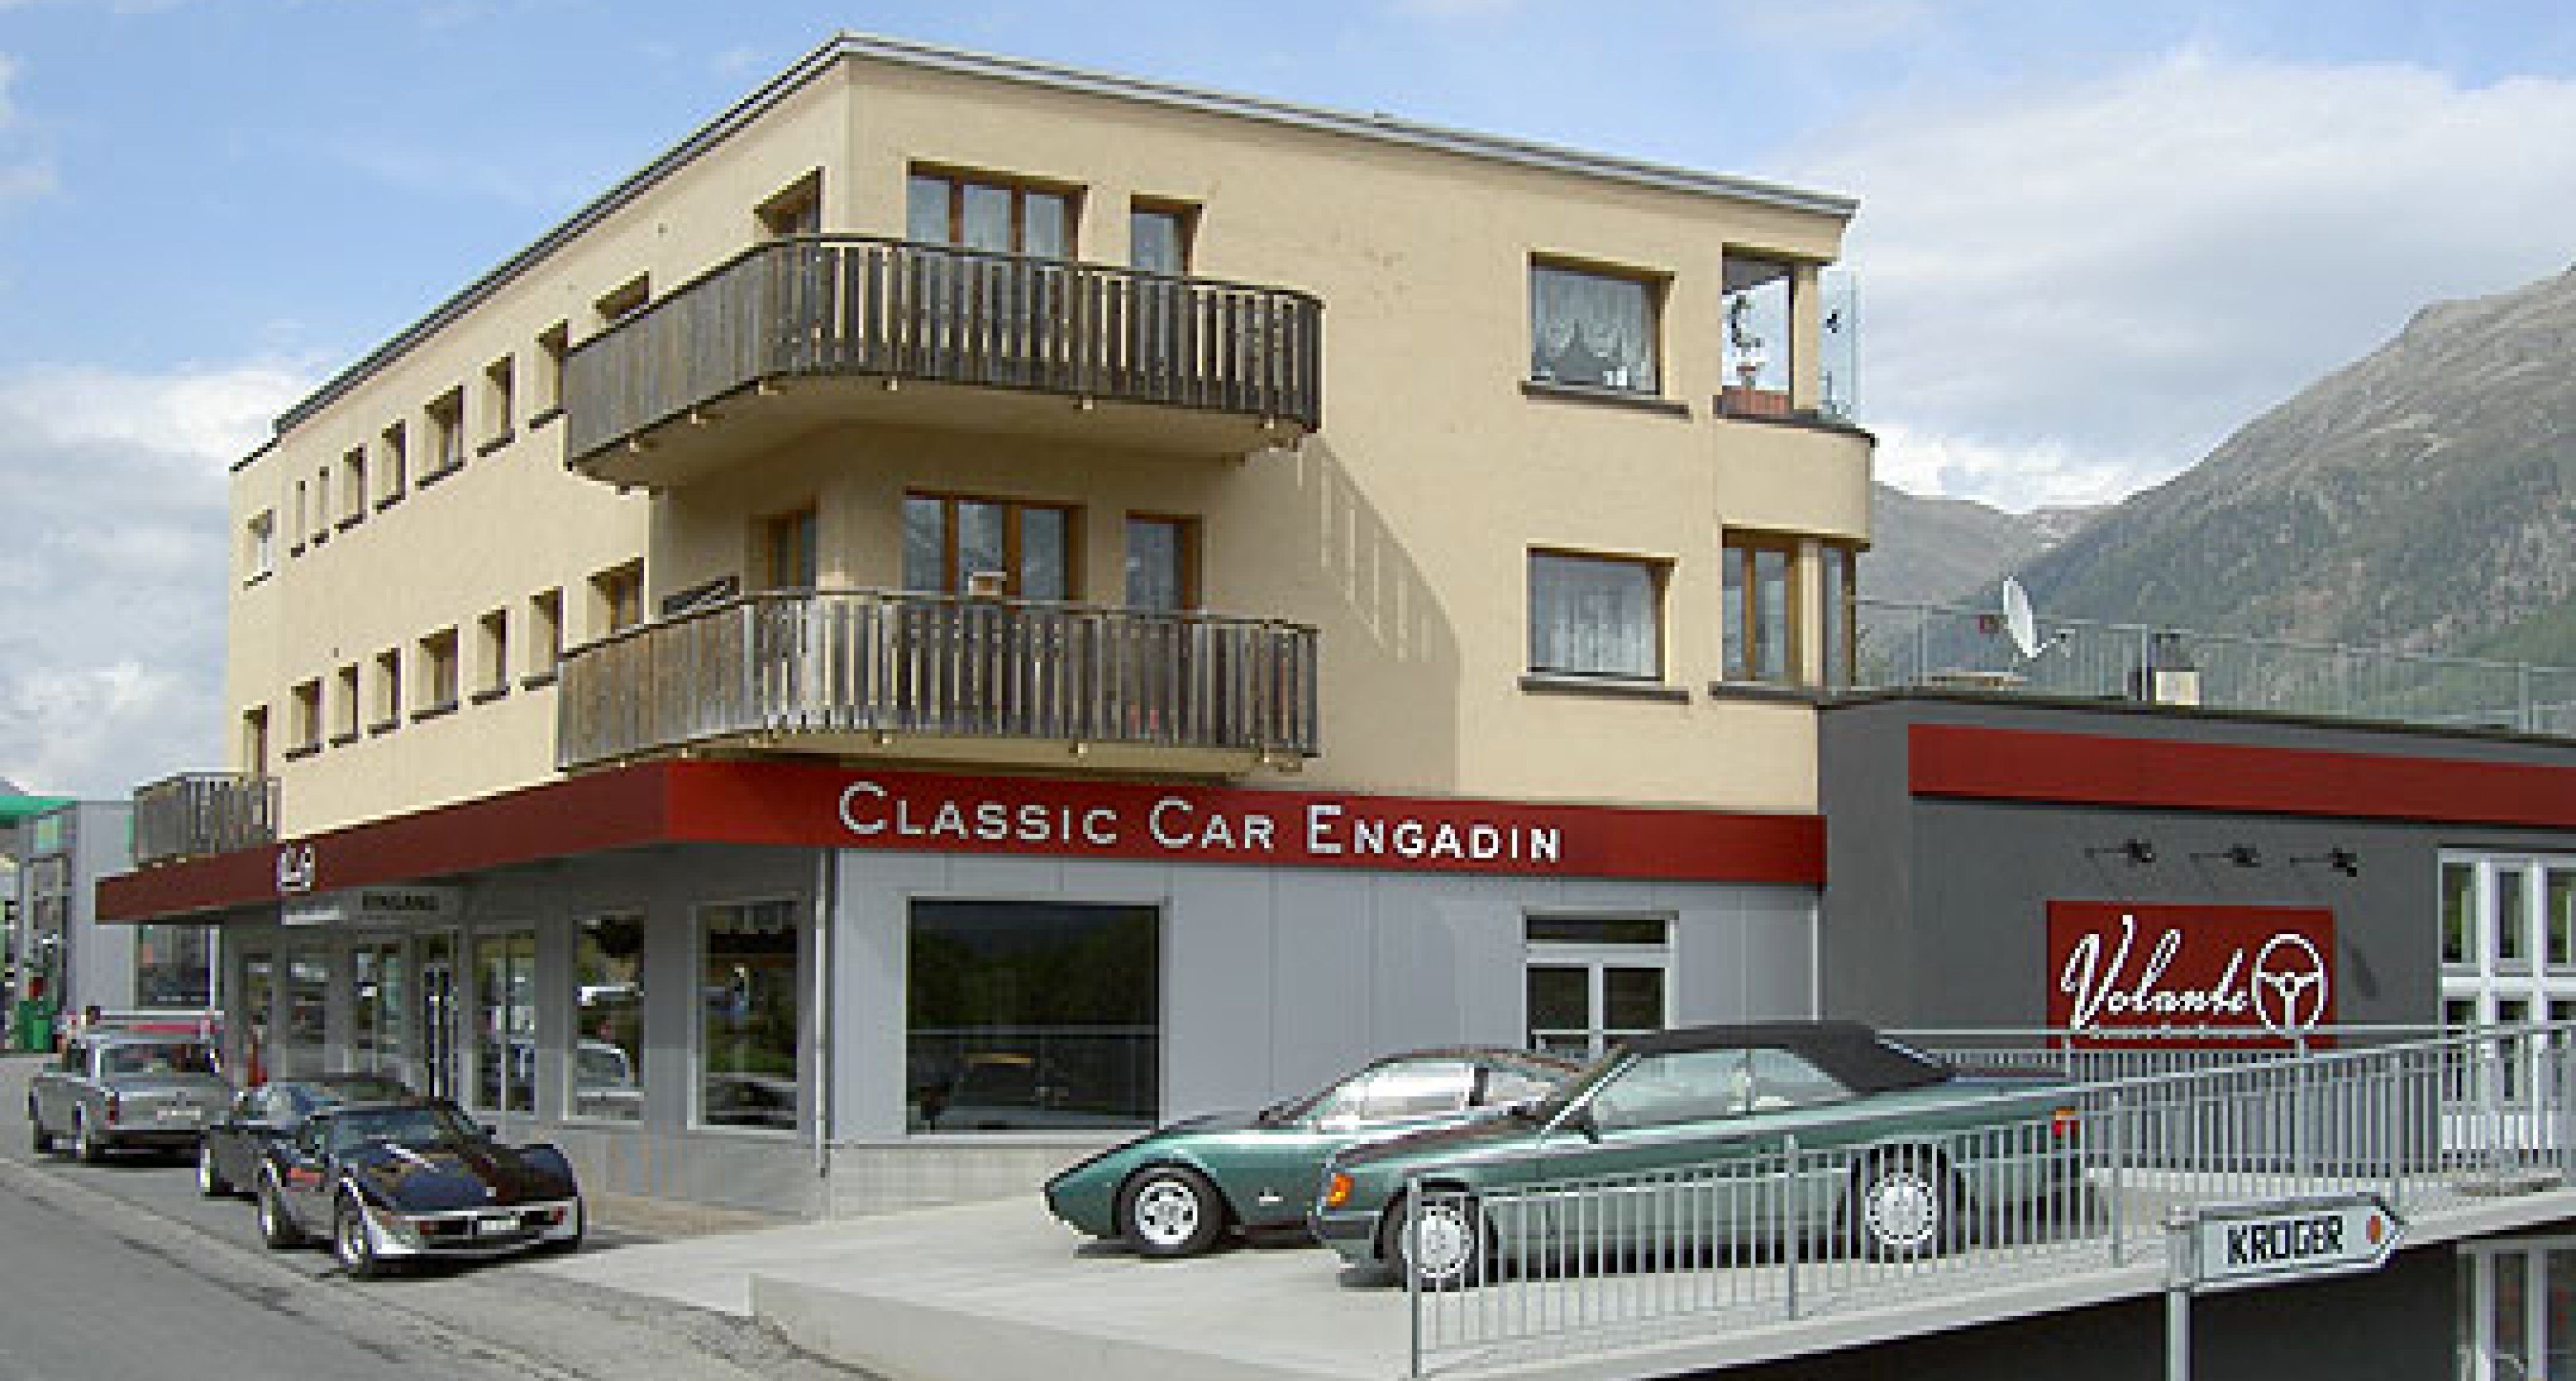 Classic Car Culture in the Engadine